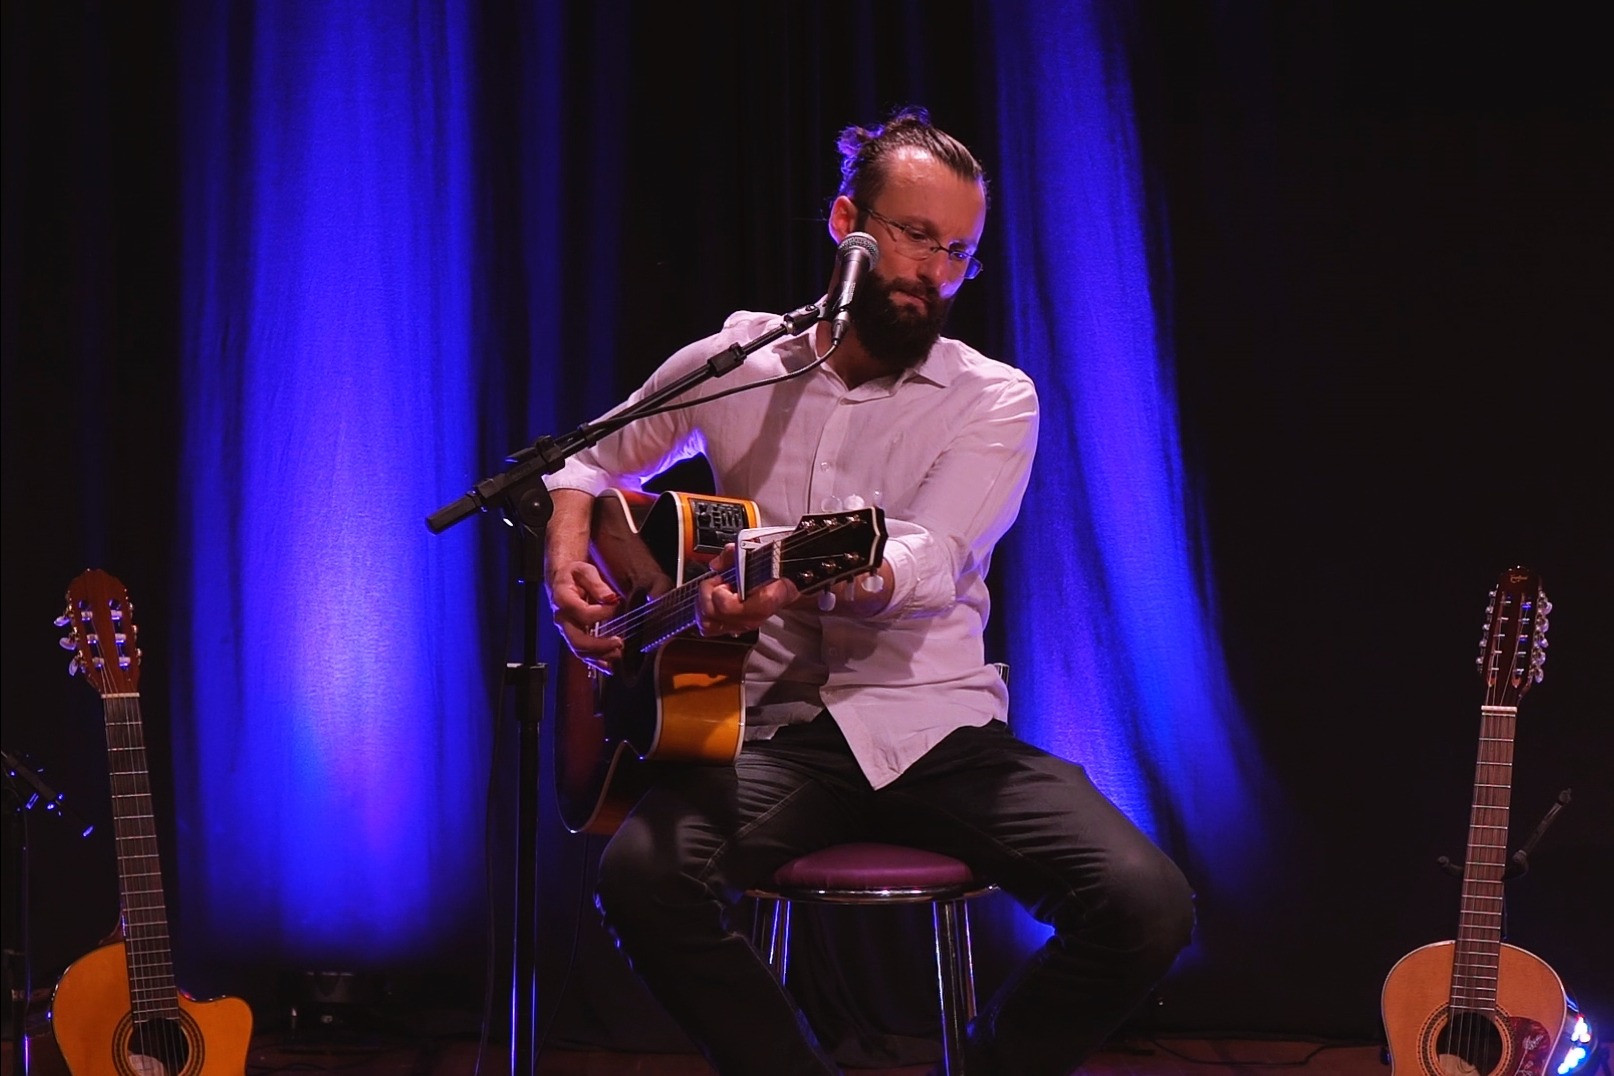 Foto Giovanni Mattiello apresenta videoclipes de canções inéditas